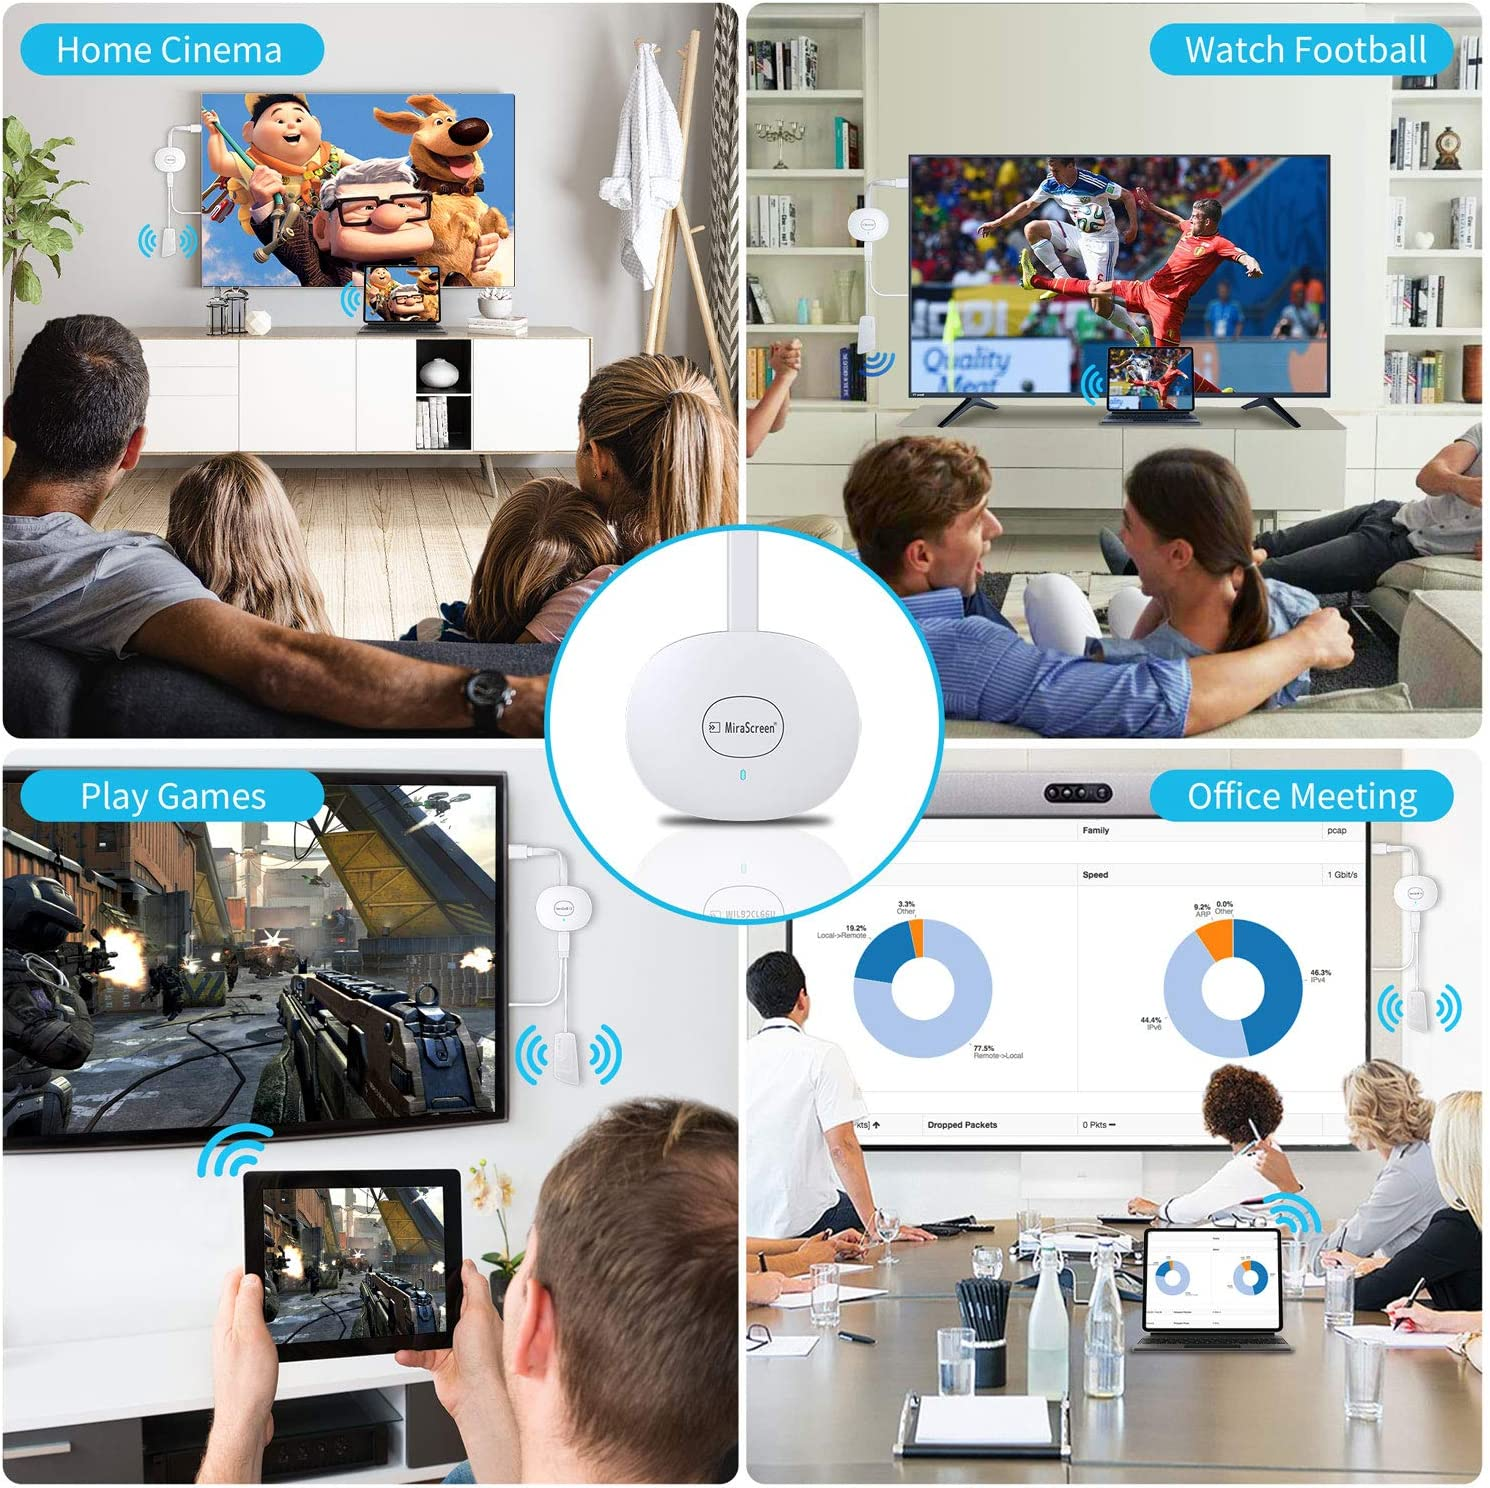 Streaming Video Receiver f/ür iPhone//iPad//IOS//Android//Windows//PC auf HD TV//Monitor//Projektor//Mac MPIO Wireless HDMI 4K Wi-Fi Display Dongle Adapter Unterst/ützung Miracast Airplay DLNA,Schwarz